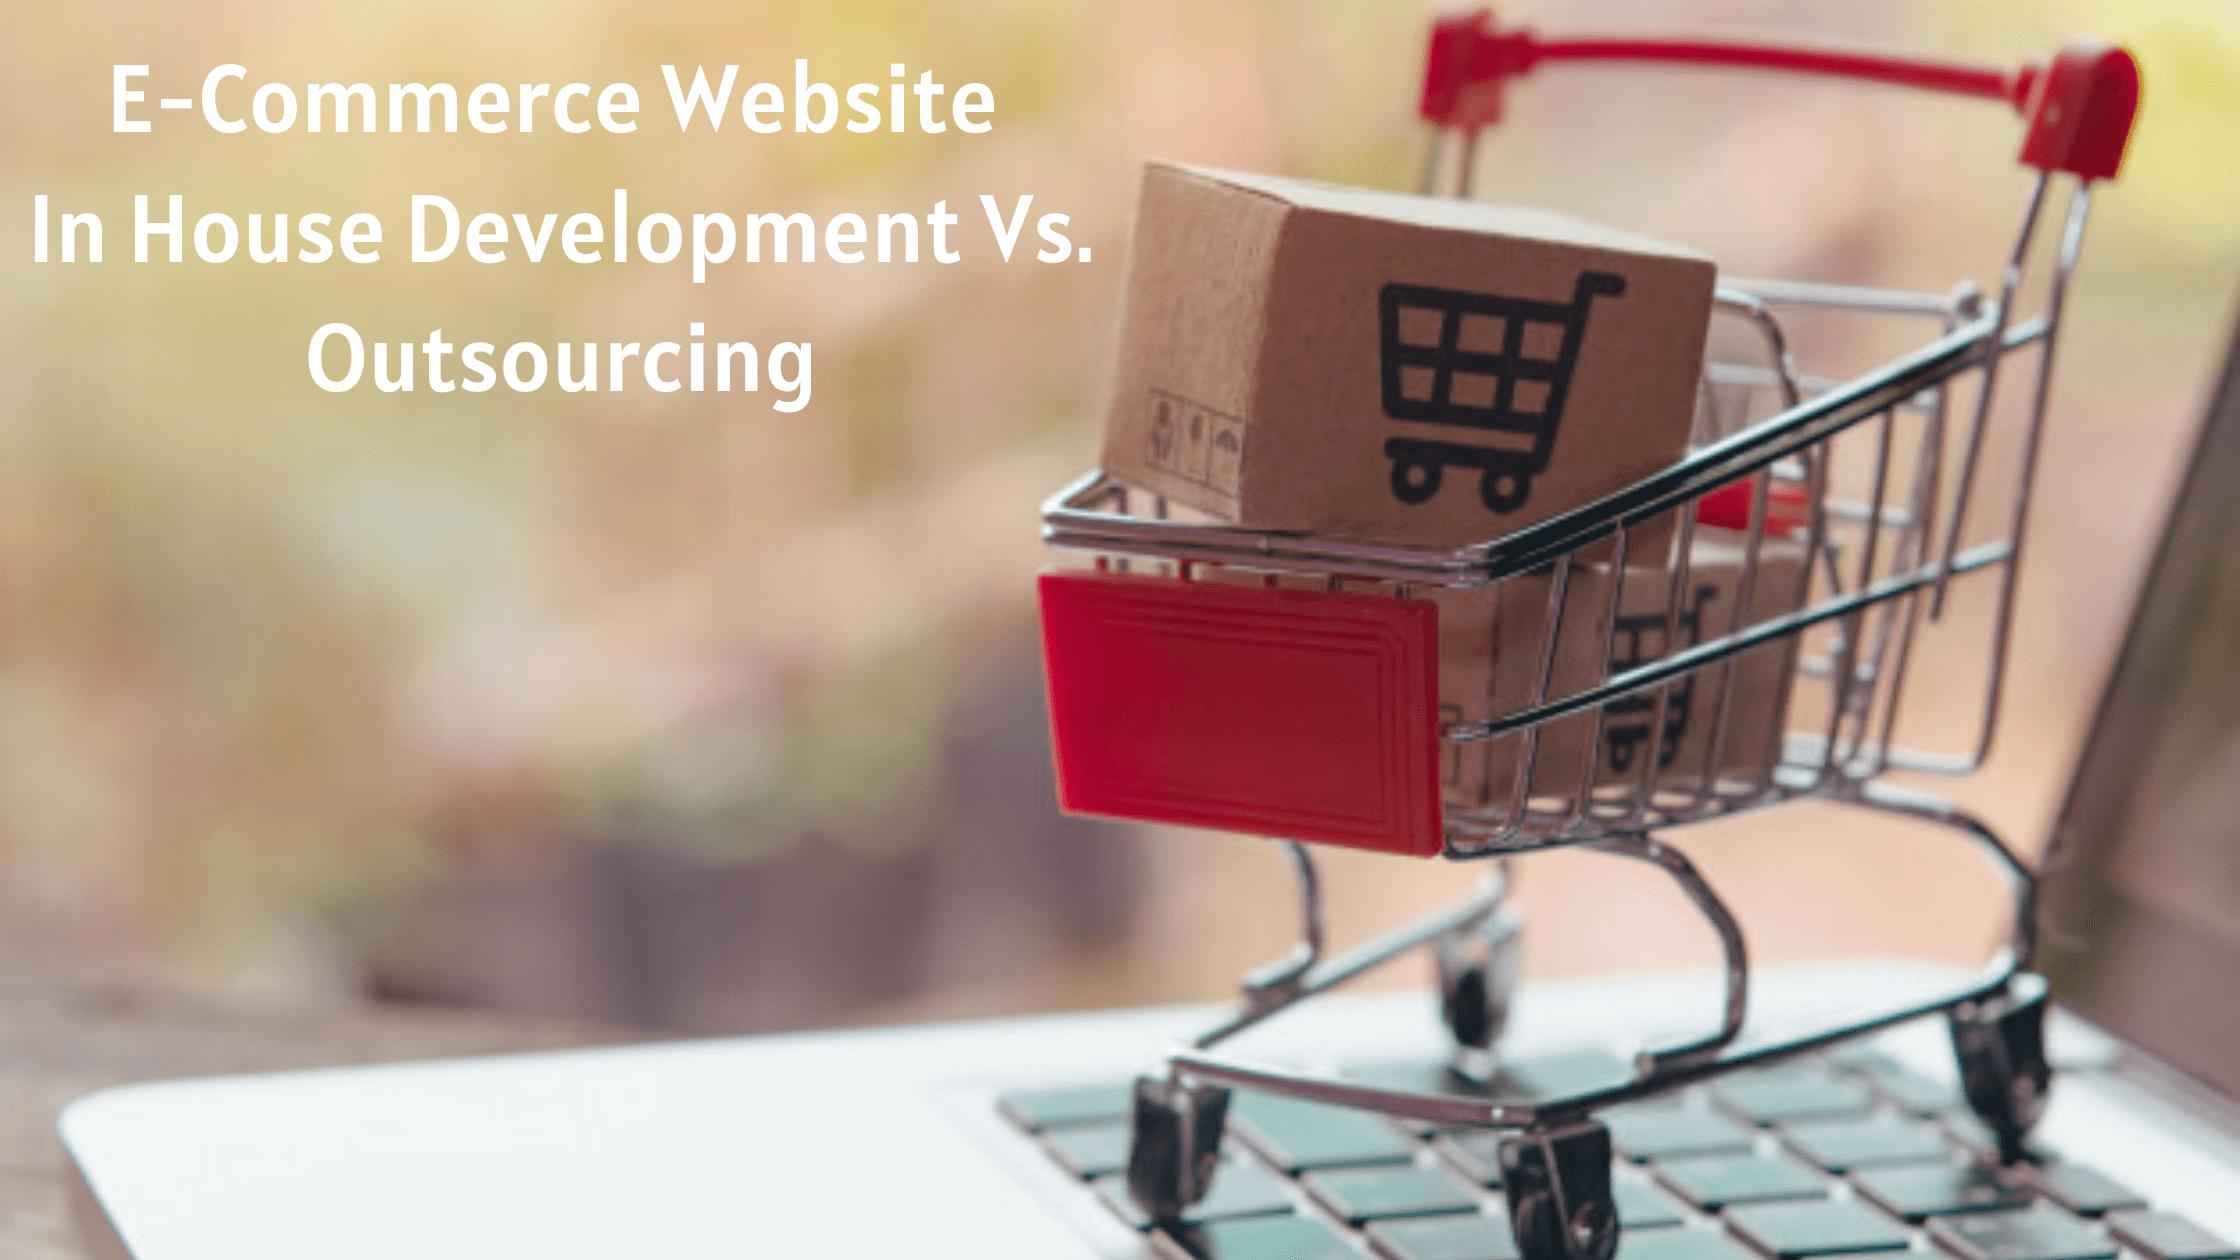 E-Commerce Website In House Development Vs. Outsourcing